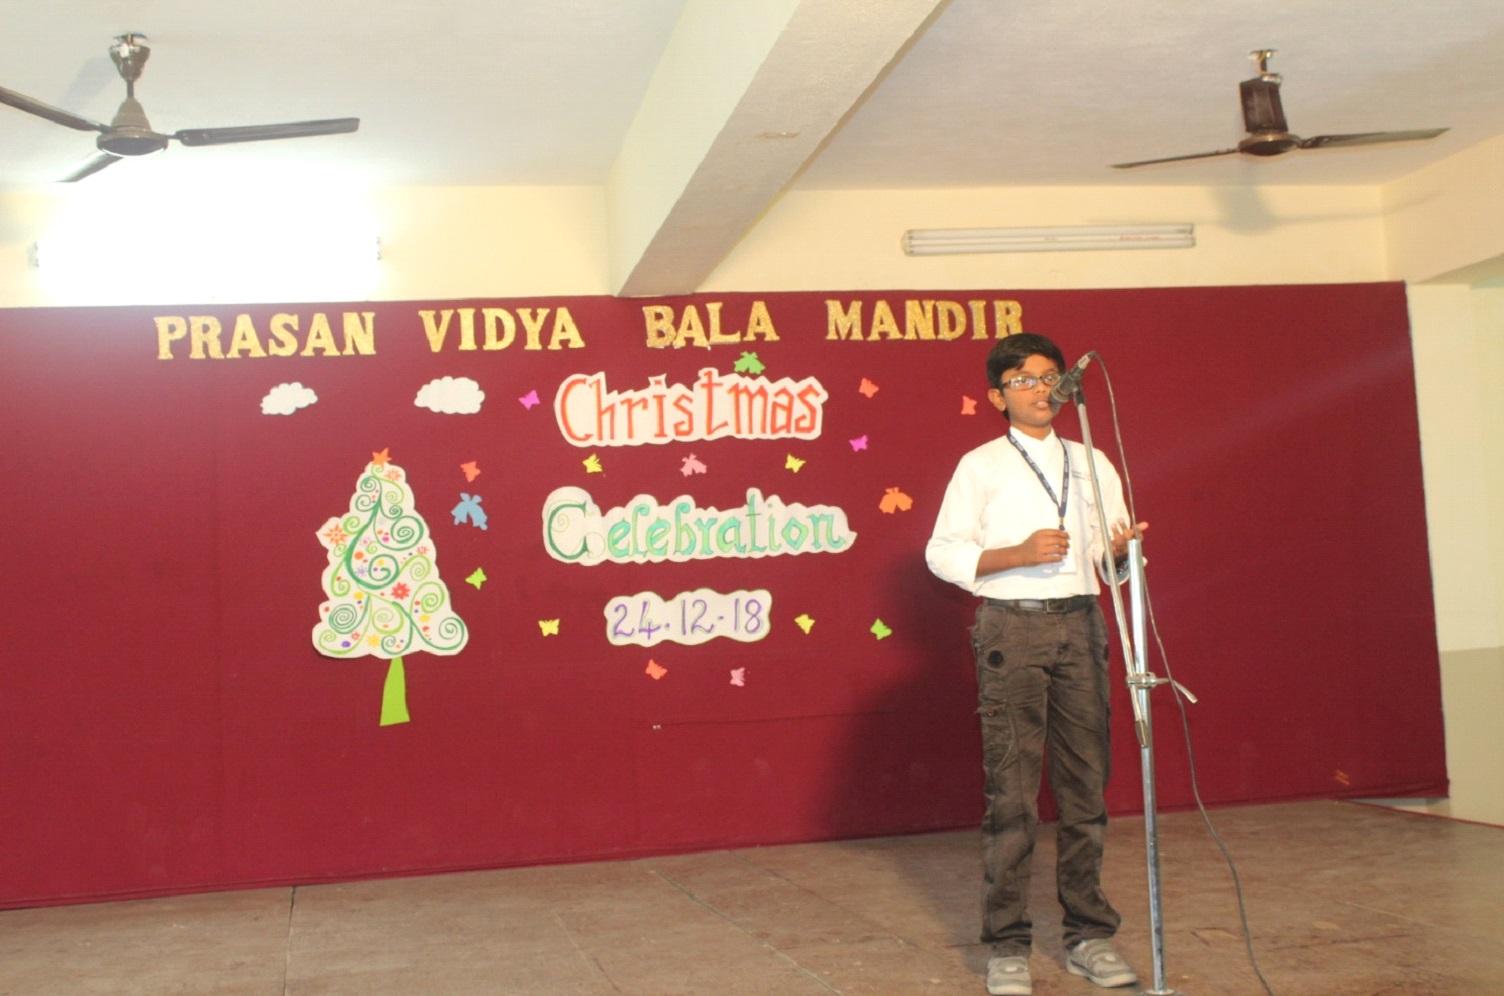 Inspiring speech on Christmas